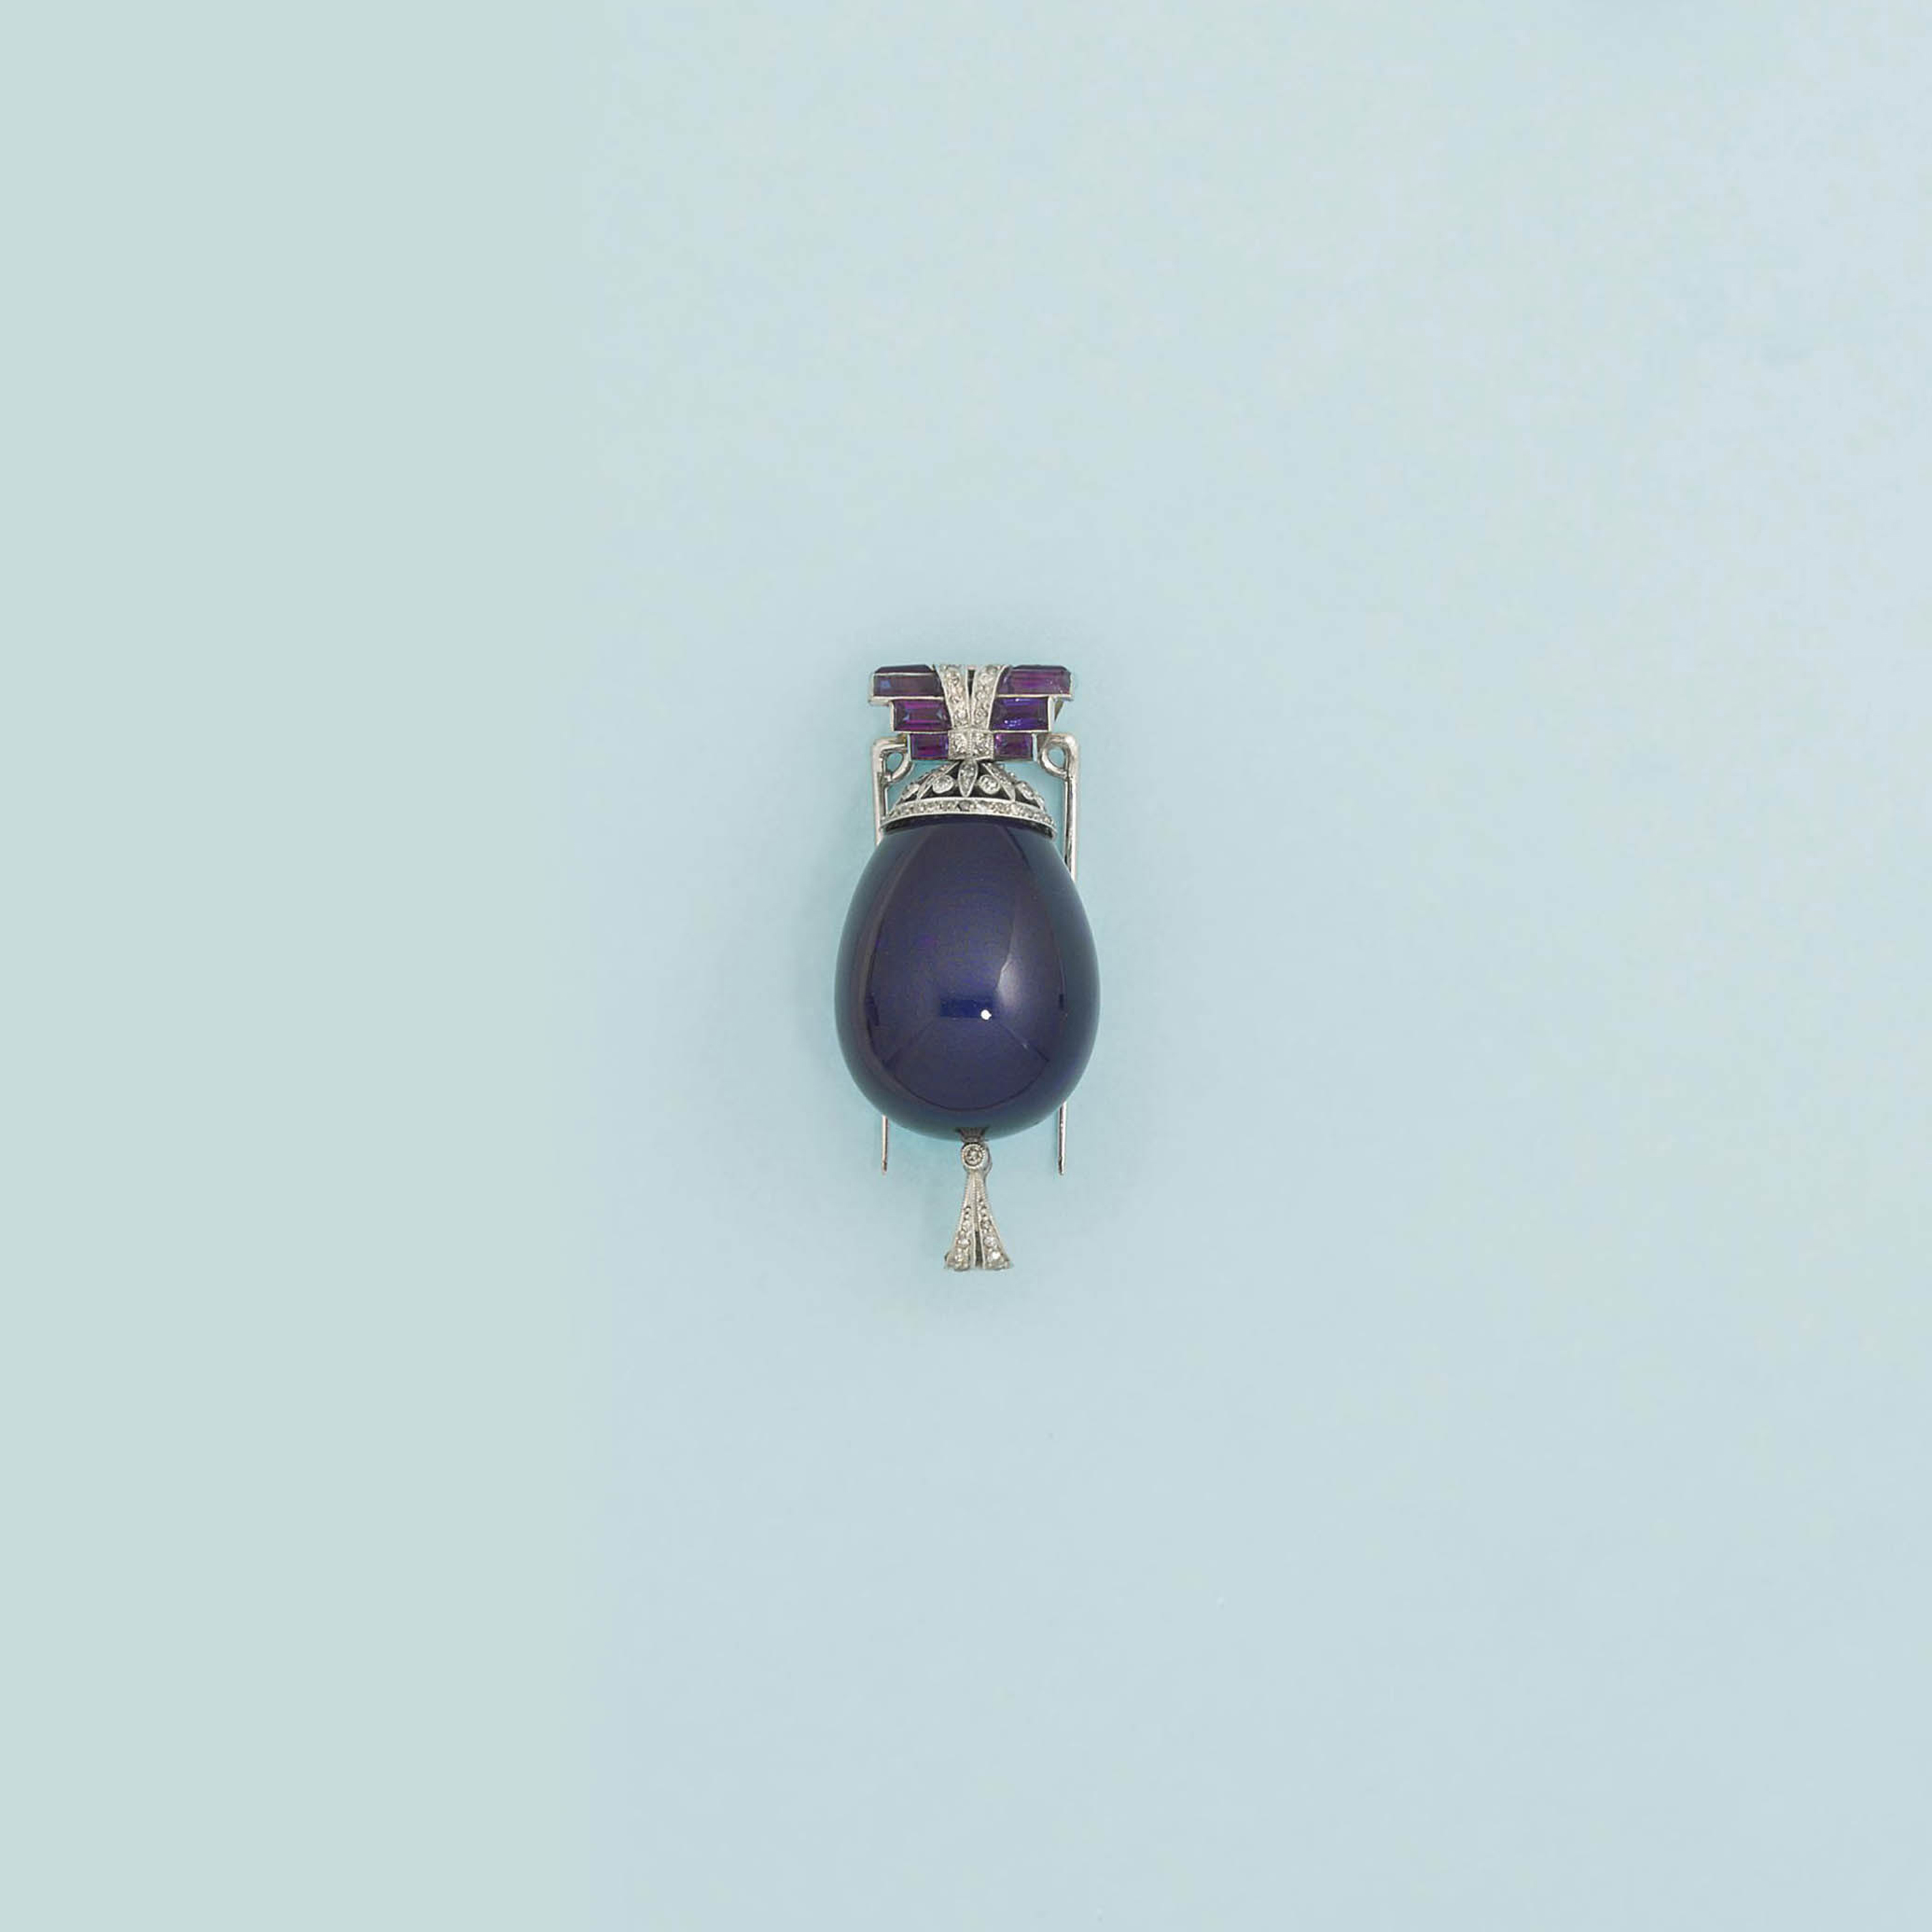 An Art deco amethyst and diamond brooch/pendant